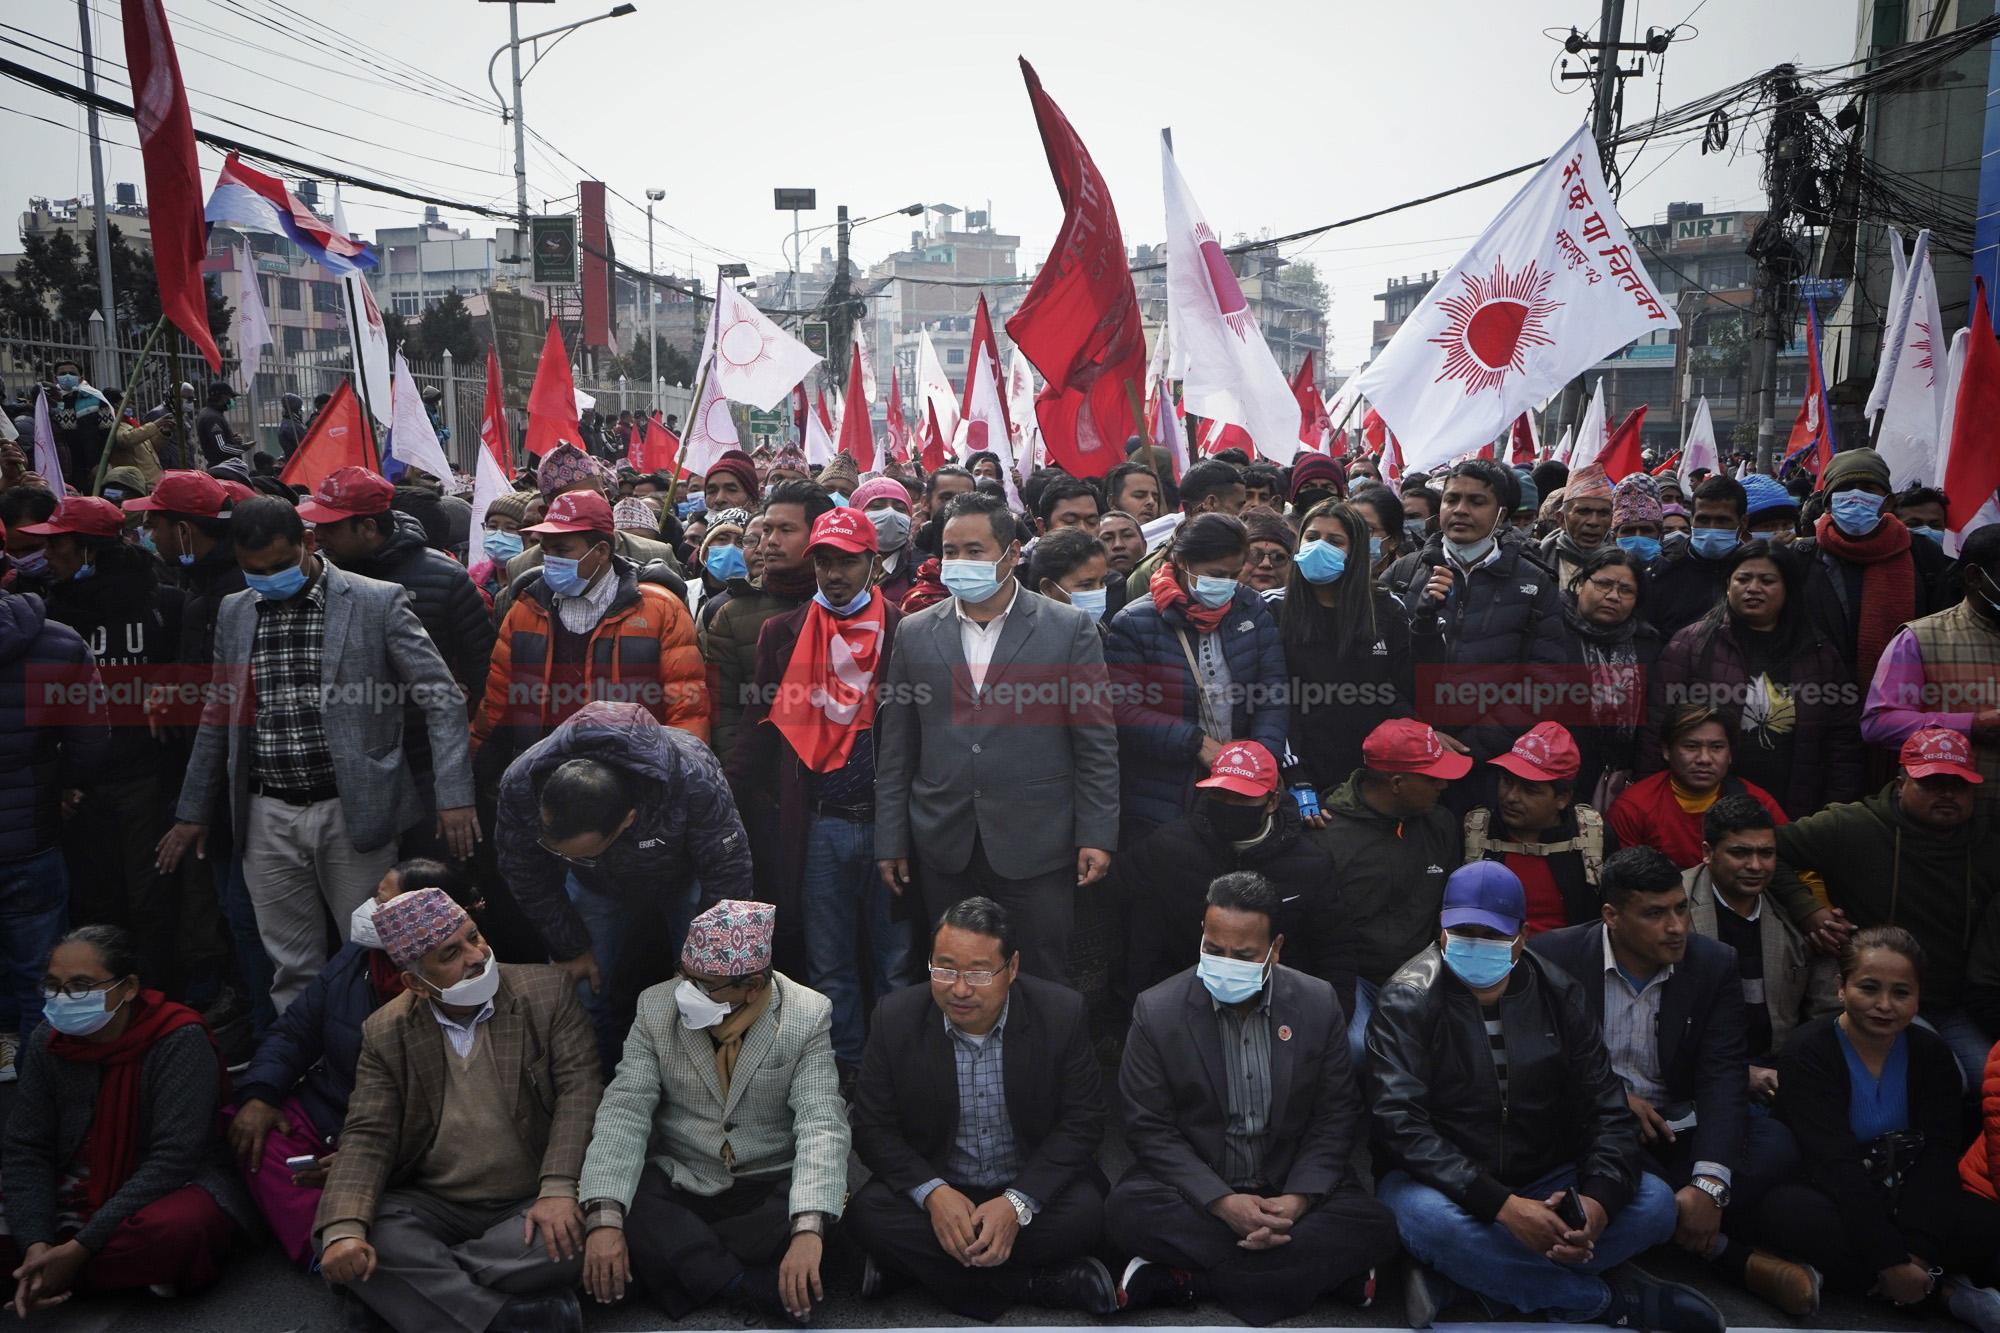 Power demonstration by Prachanda-Madhav faction